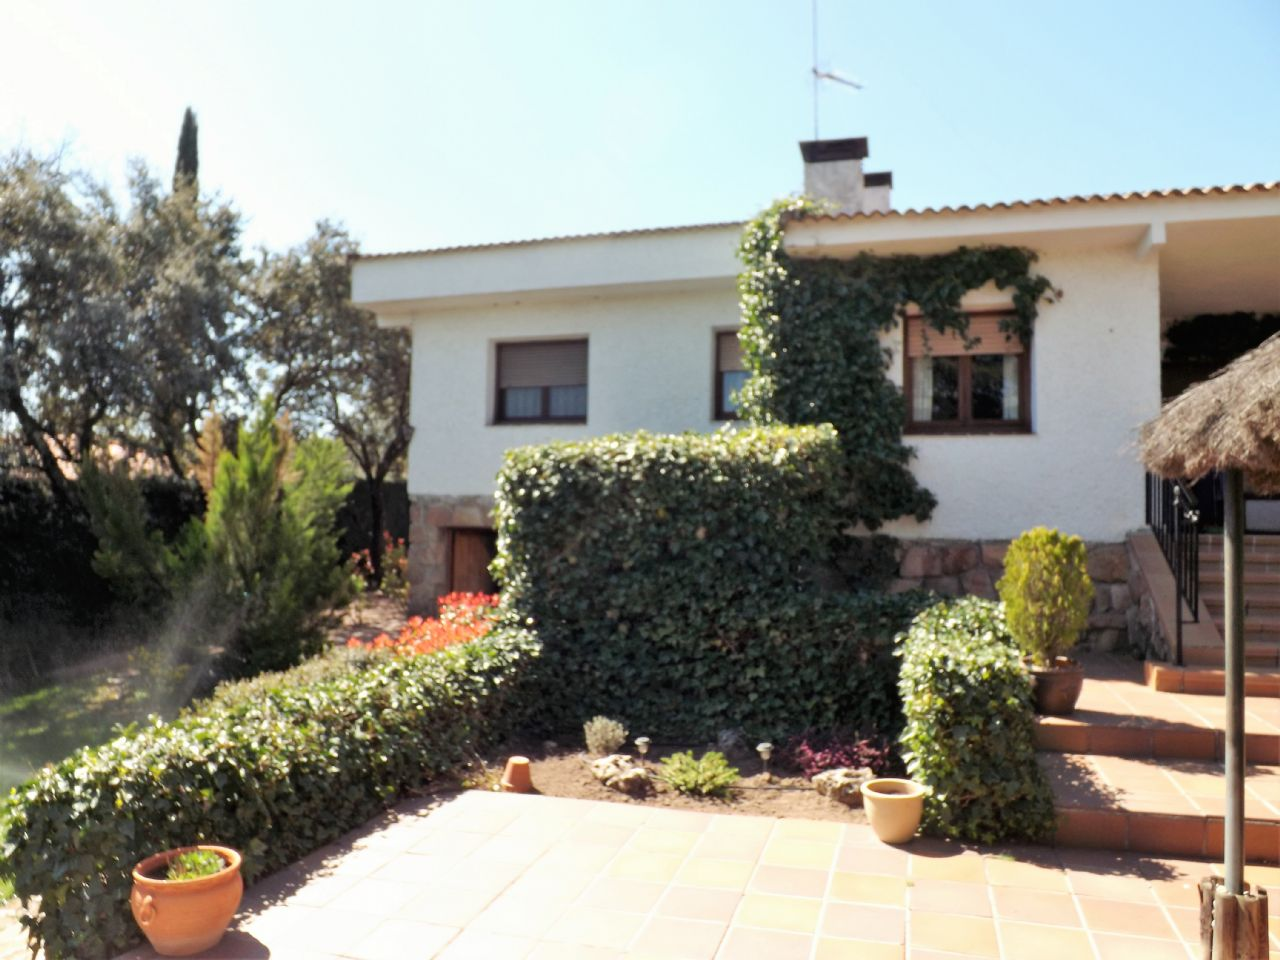 Casa / Chalet en Villanueva de la Cañada, URB. VILLAFRANCA DEL CASTILLO, venta